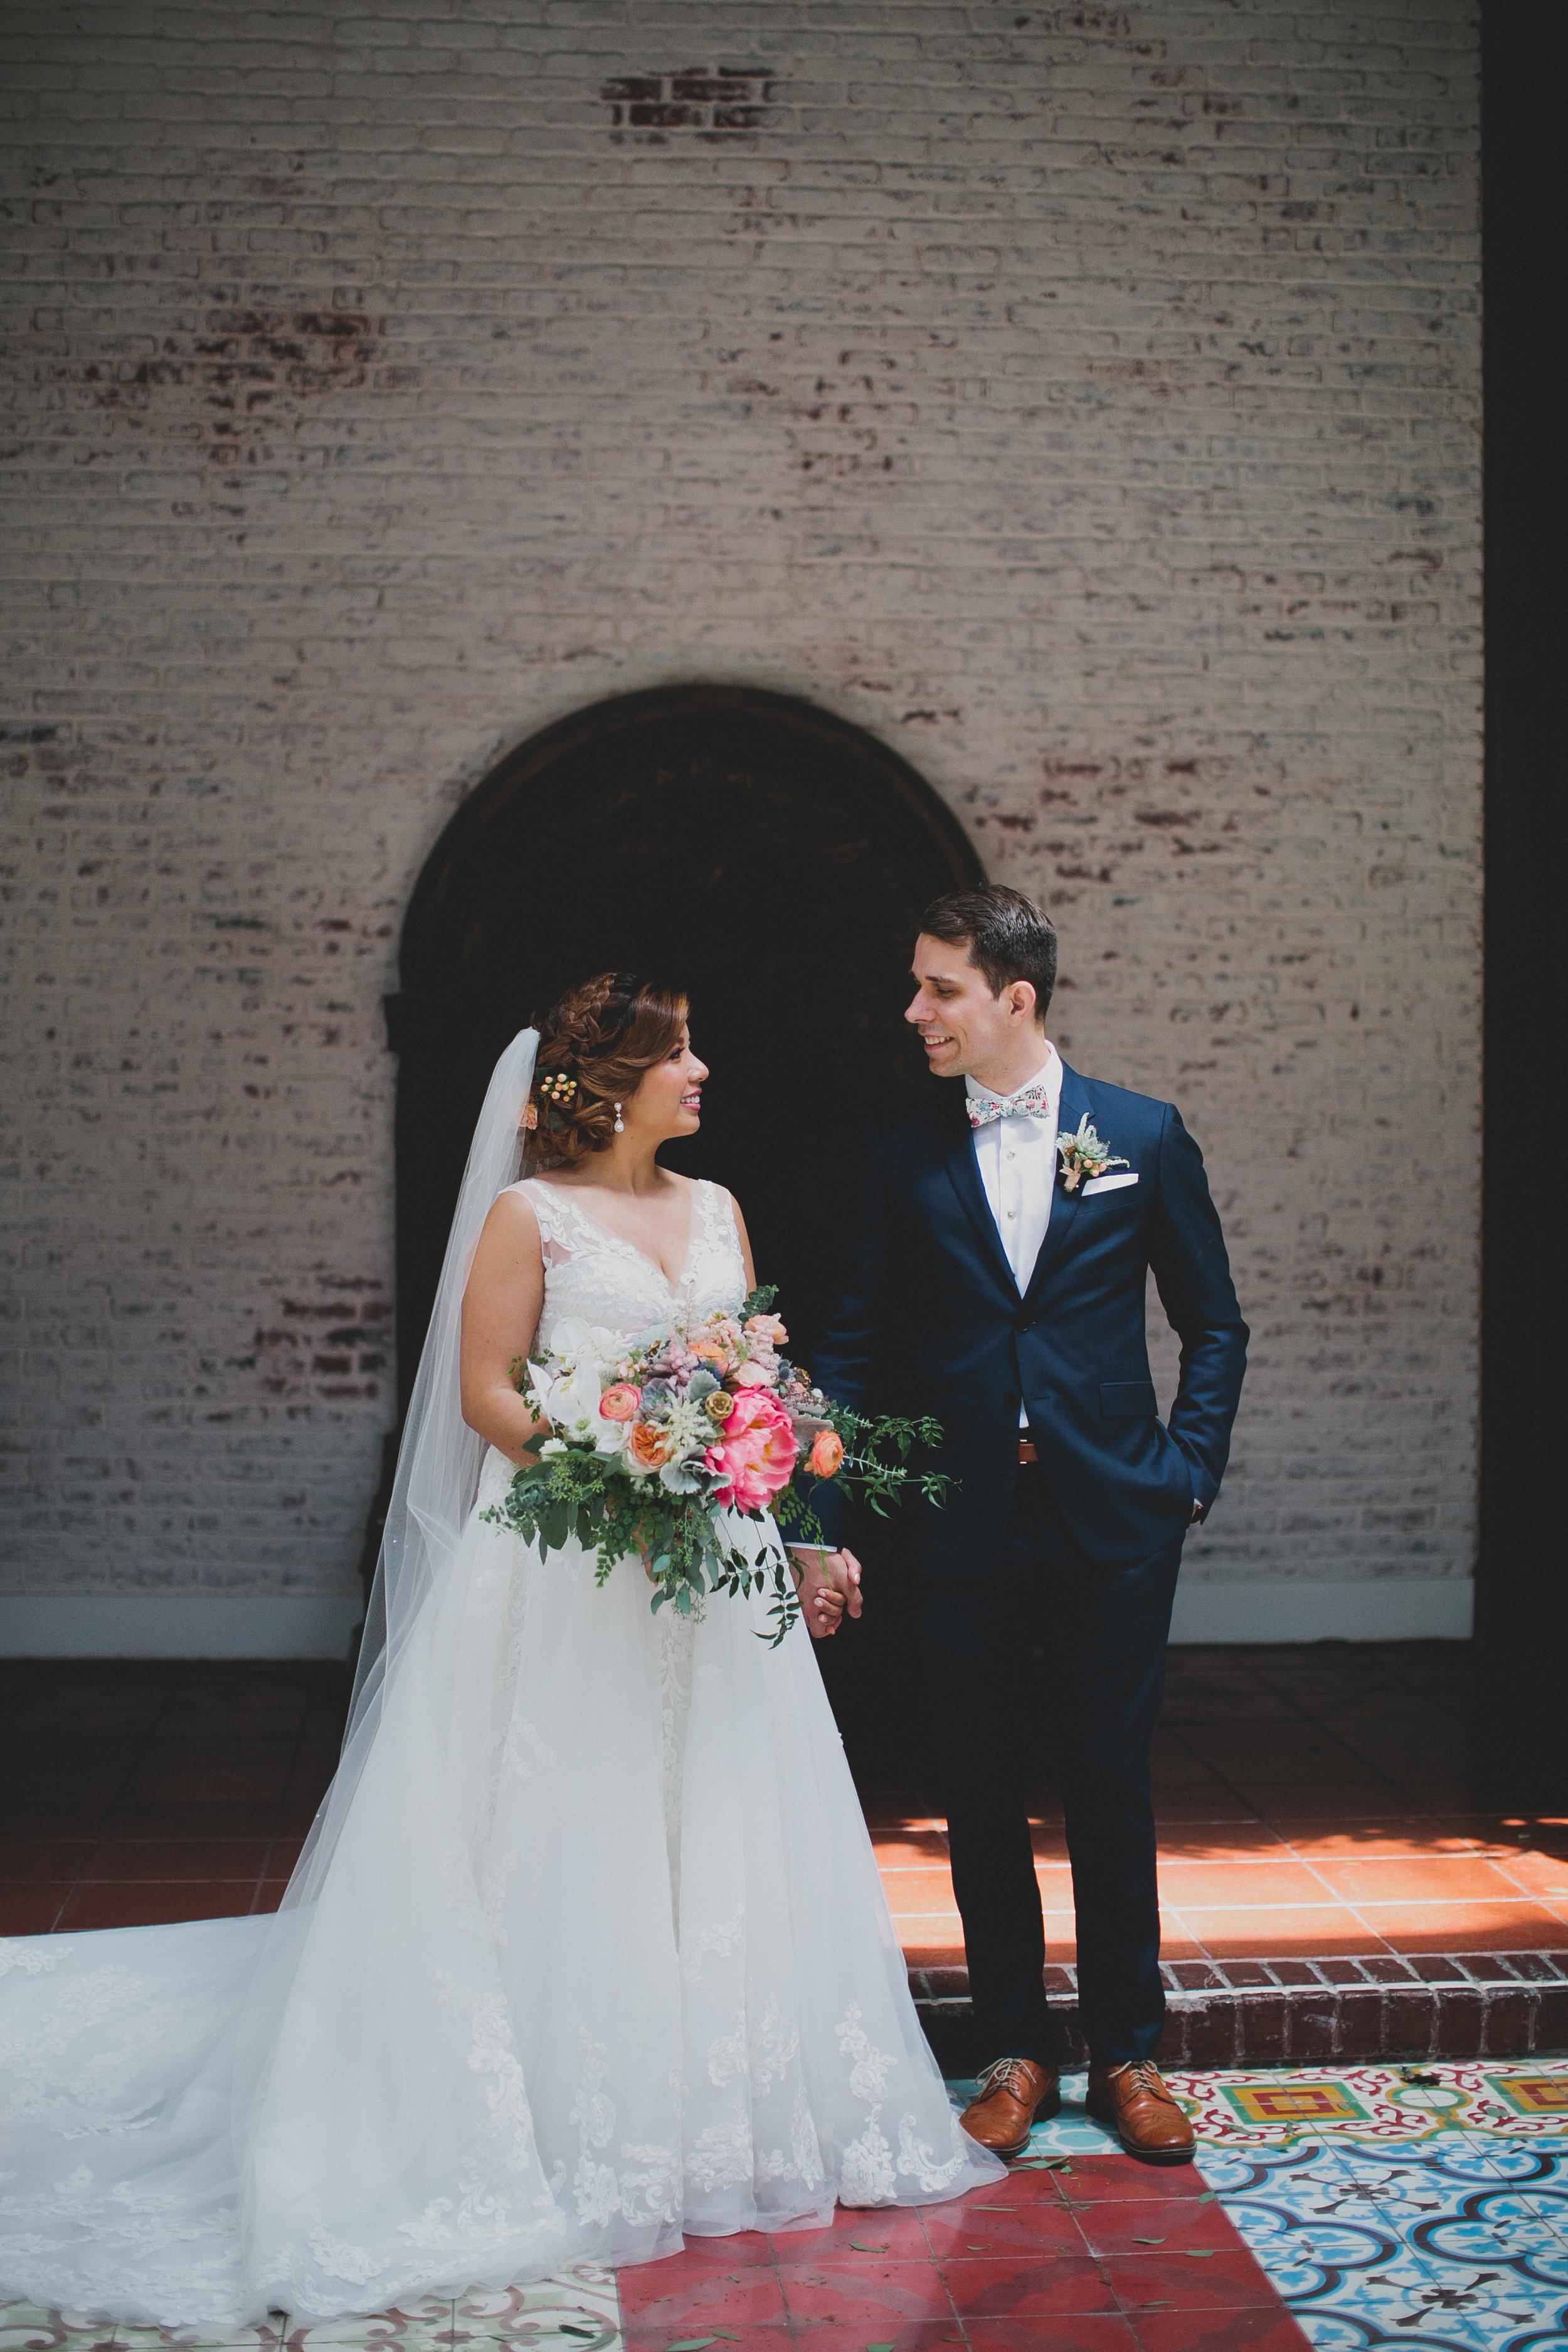 TiffanyAldis_Wedding_KatiePritchard-141.jpg